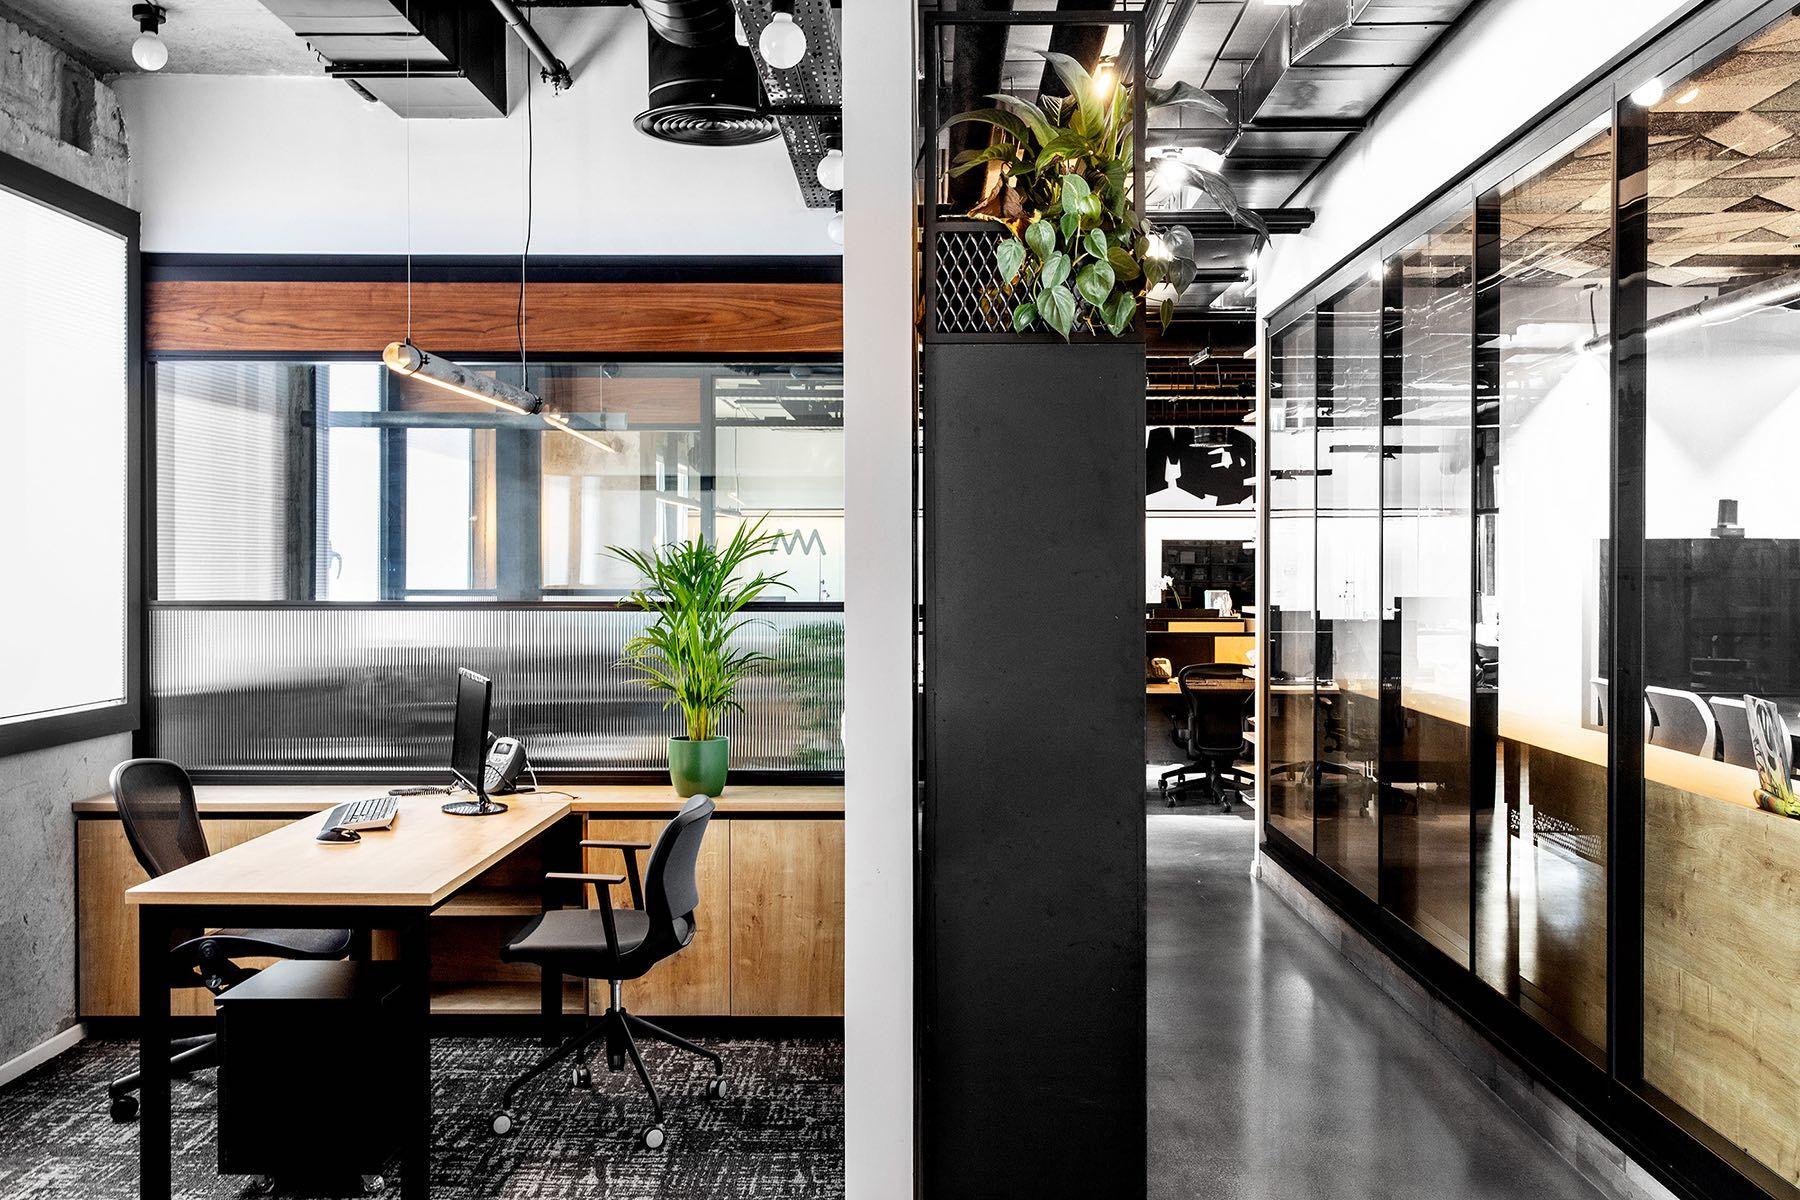 A Look Inside Art Medical S Biophilic Tel Aviv Office In 2020 Interior Architecture Design Office Interior Design Office Design